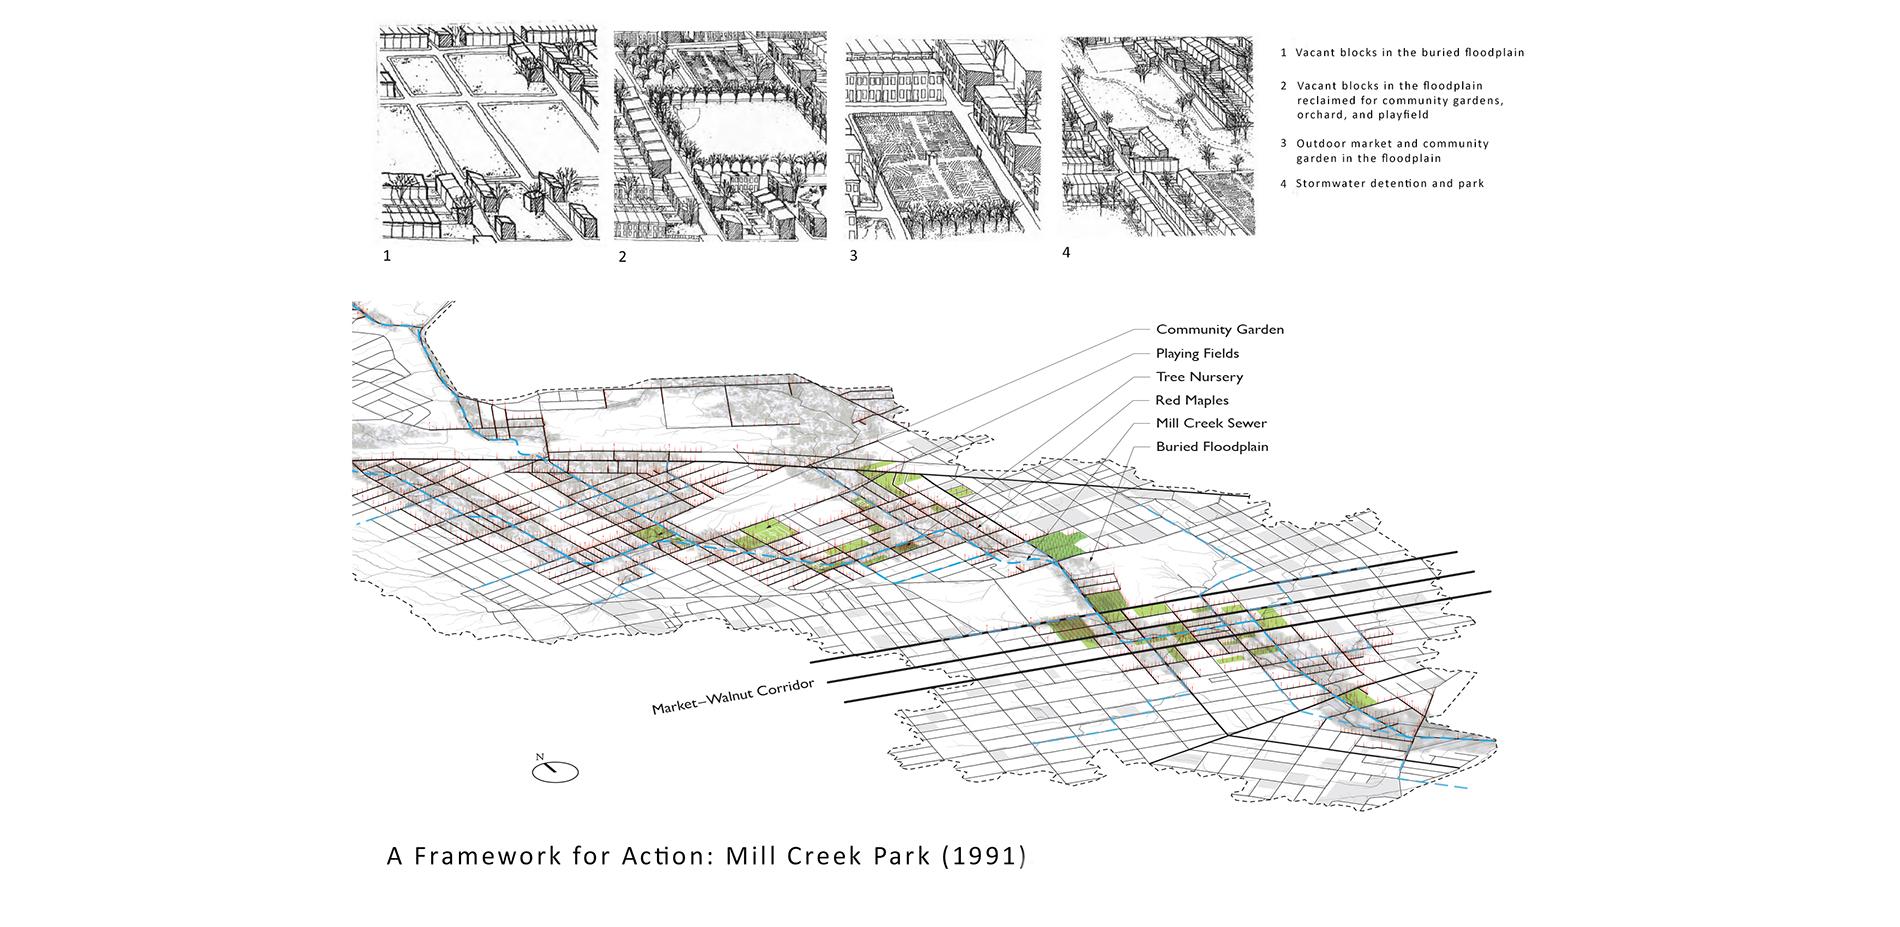 Designing a Framework for Action: Mill Creek Park (1991-Present)